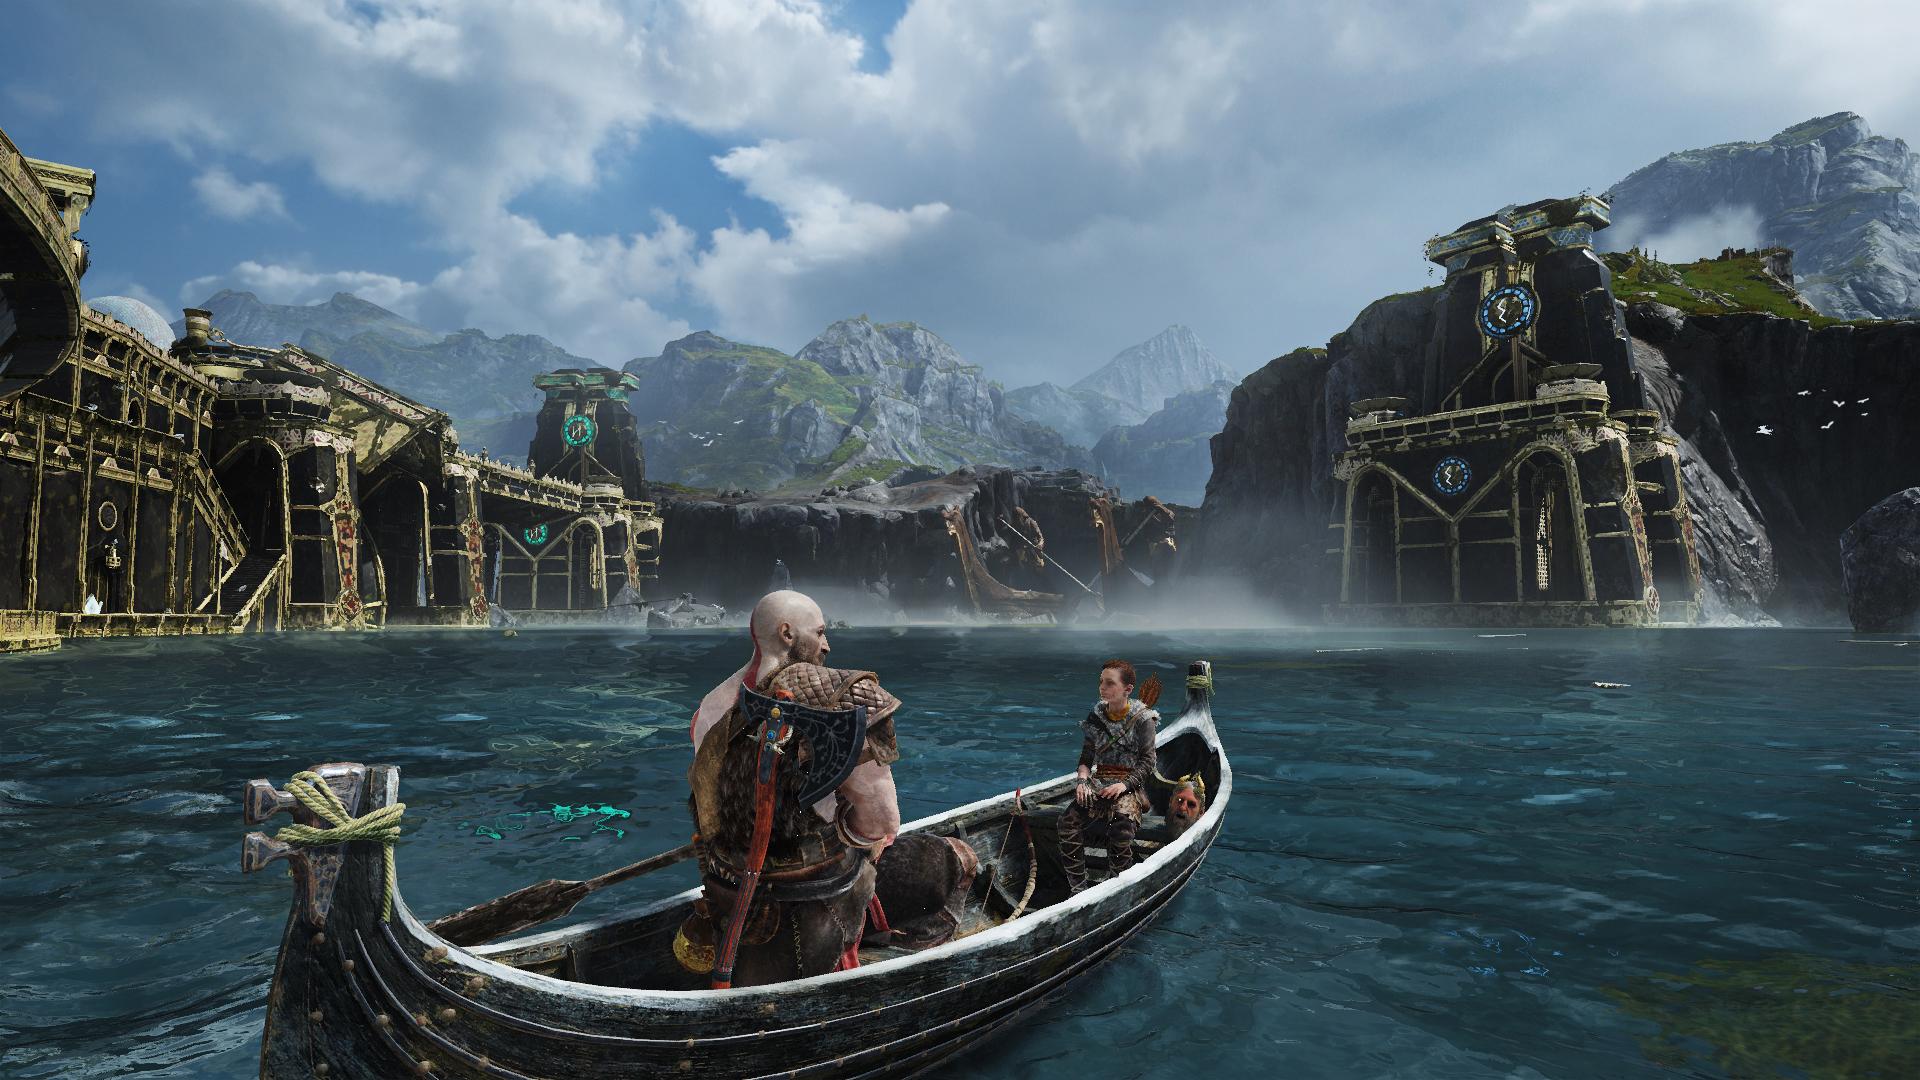 God of War Lake of 9 Realms